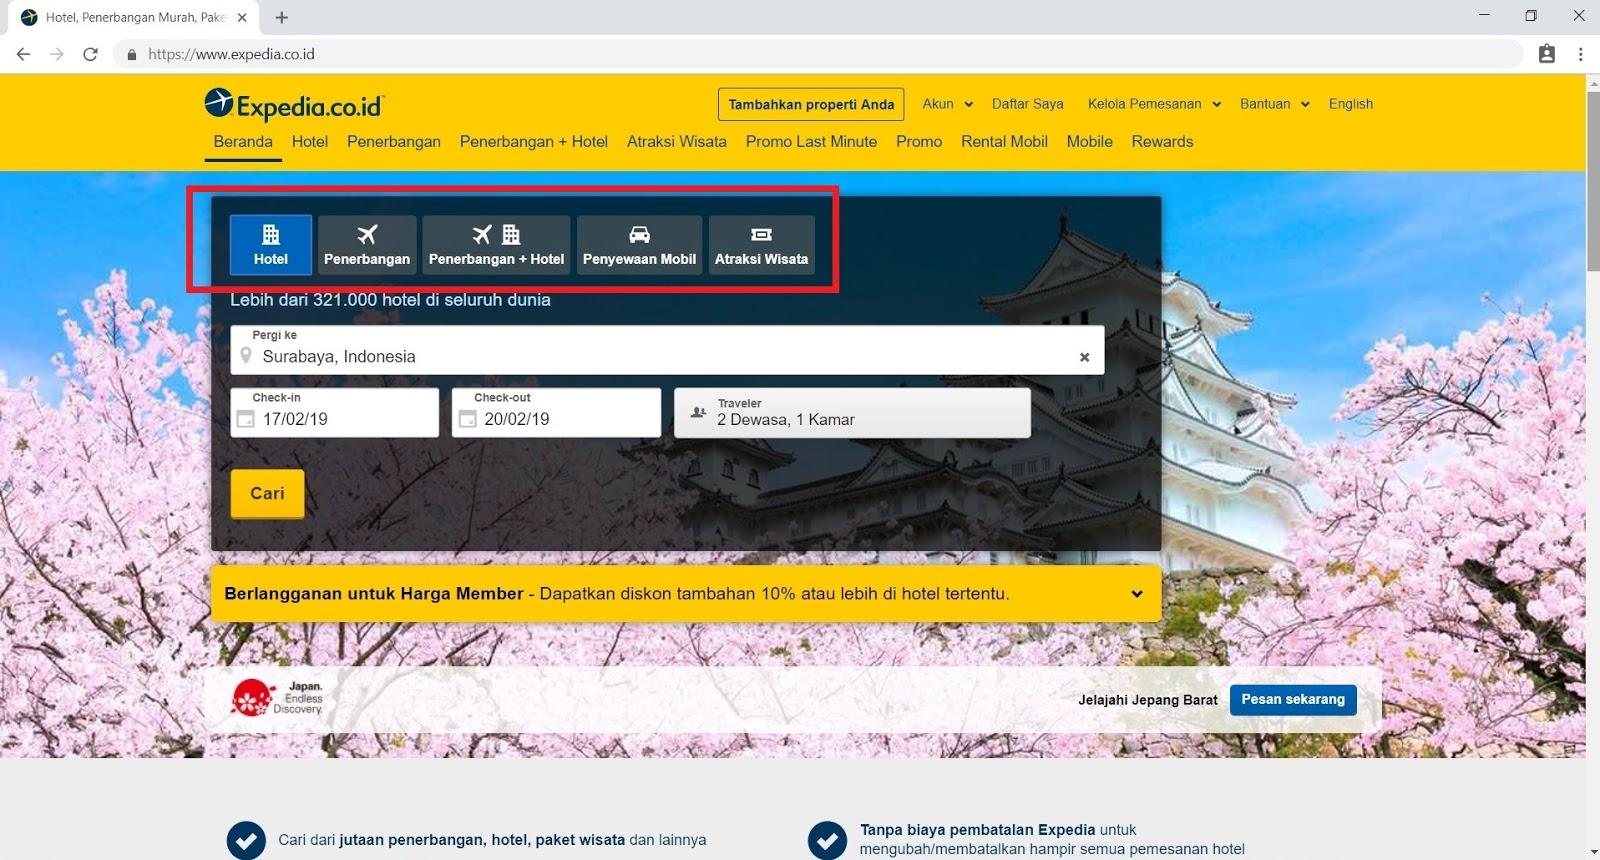 gratis-jasa-reservasi-hotel---flight-via-expedia-tanpa-kartu-kredit---paypal